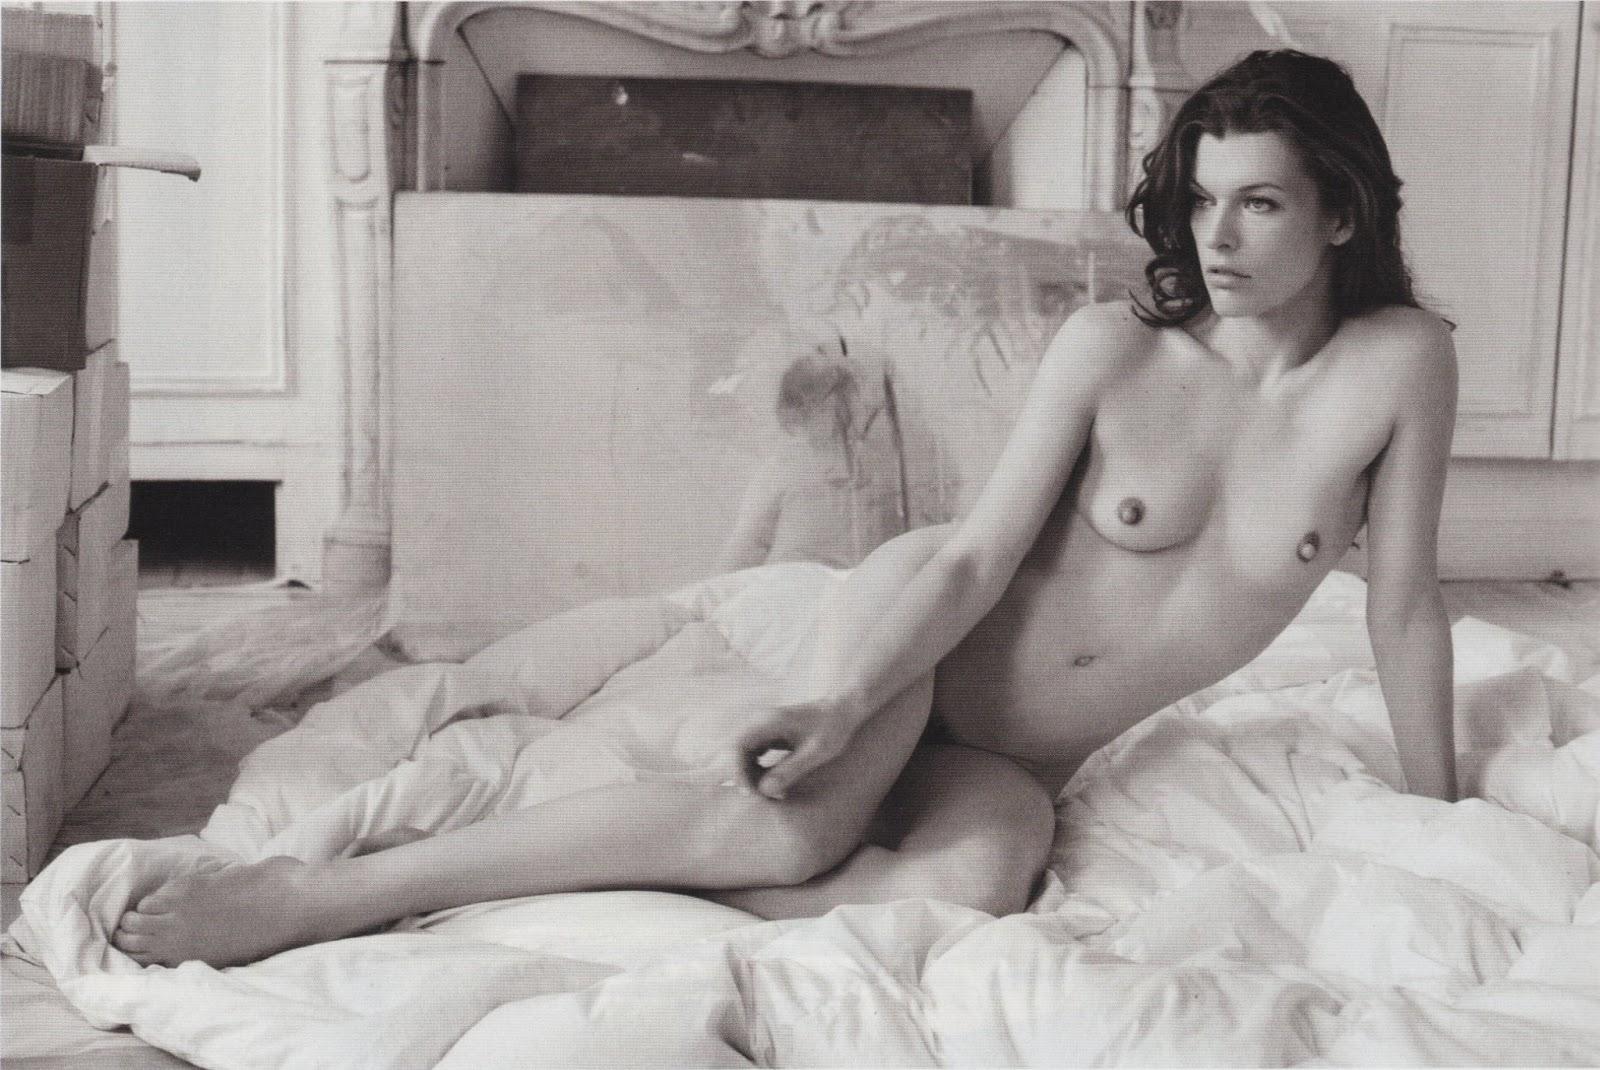 http://2.bp.blogspot.com/-26tPUtx6xUI/UTNycf1RxII/AAAAAAAAyr0/gVJyR5W0gd8/s1600/Milla+Jovovich+Completely+Naked+In+%2526quot-Purple%2526quot-+Magazine+F-W+2009+MQ-HQ+Scans+13.jpg